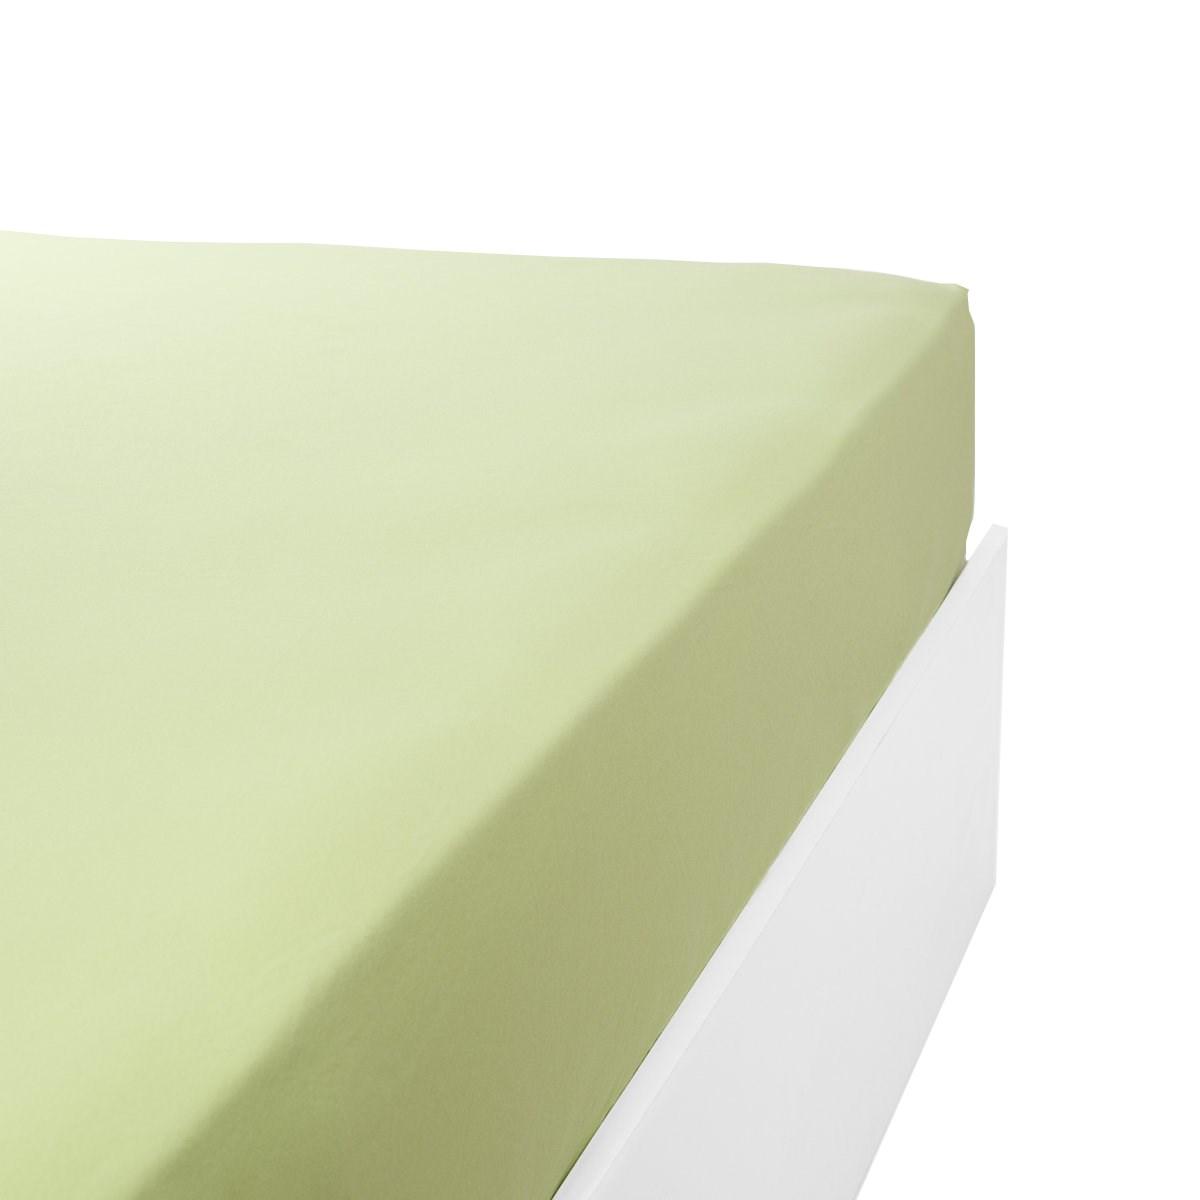 Drap housse flanelle en Molleton Vert anis 140x200 cm